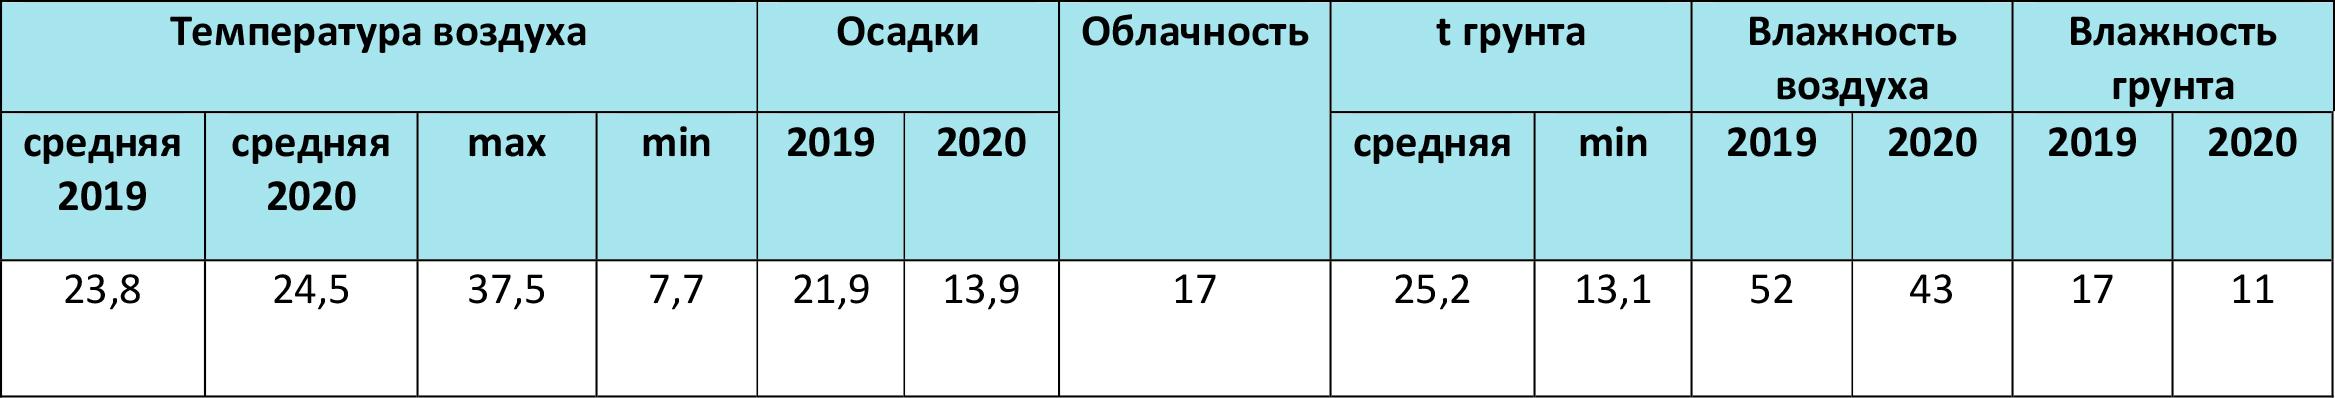 Метеоданные по Херсонской области за август 2019-2020 гг., по данным «Метео Фарм»